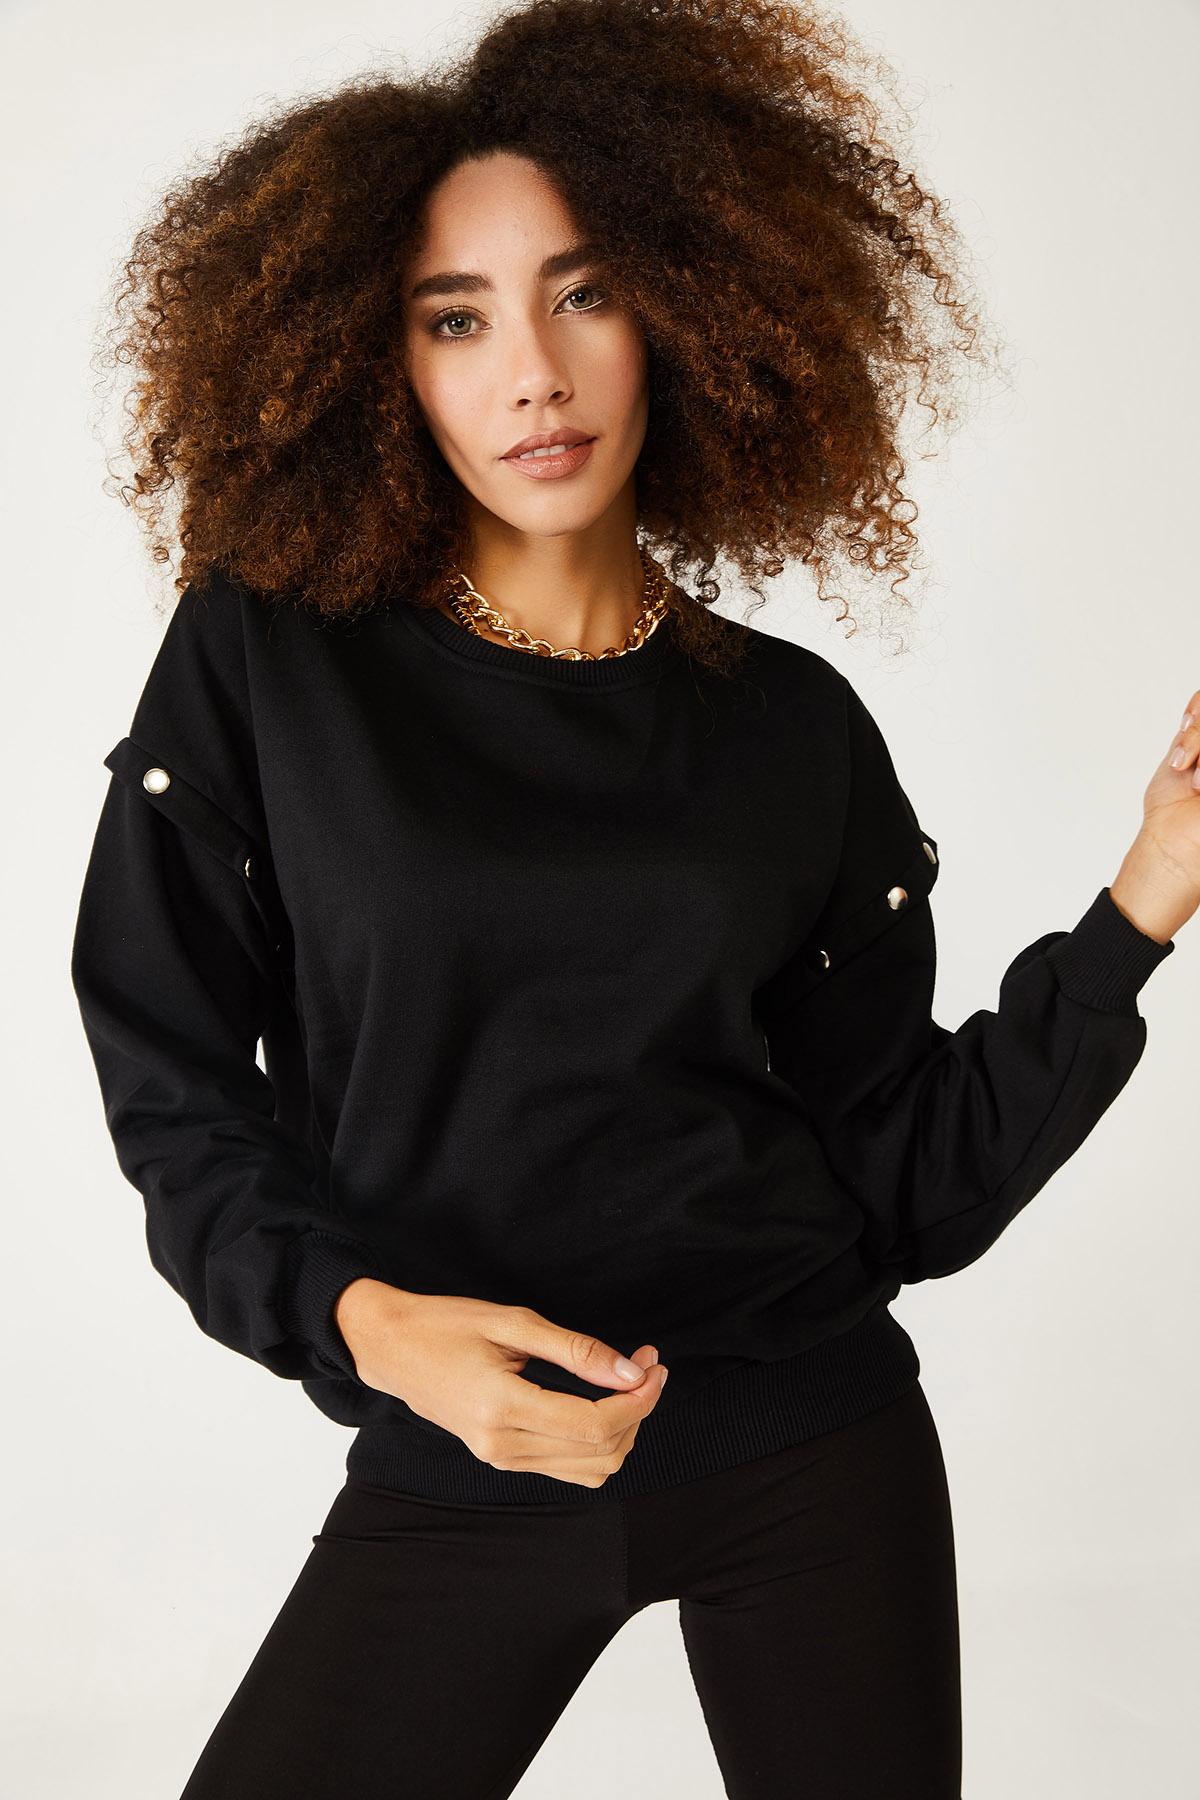 XHAN - Siyah Çıtçıt Detaylı Sweatshirt 1KXK8-44428-02